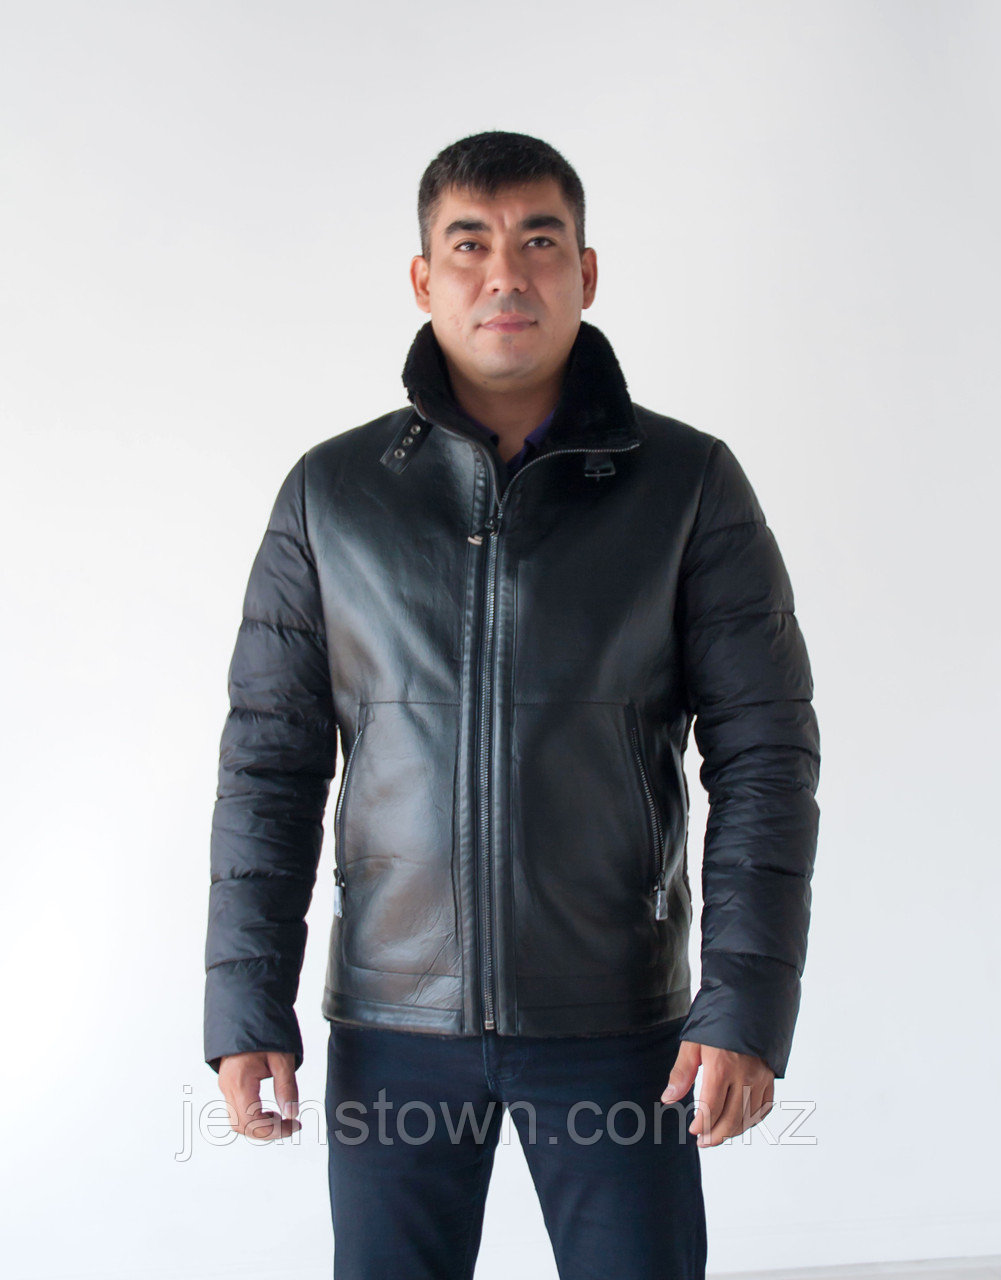 Куртка мужская   Vivacana  короткая,черная